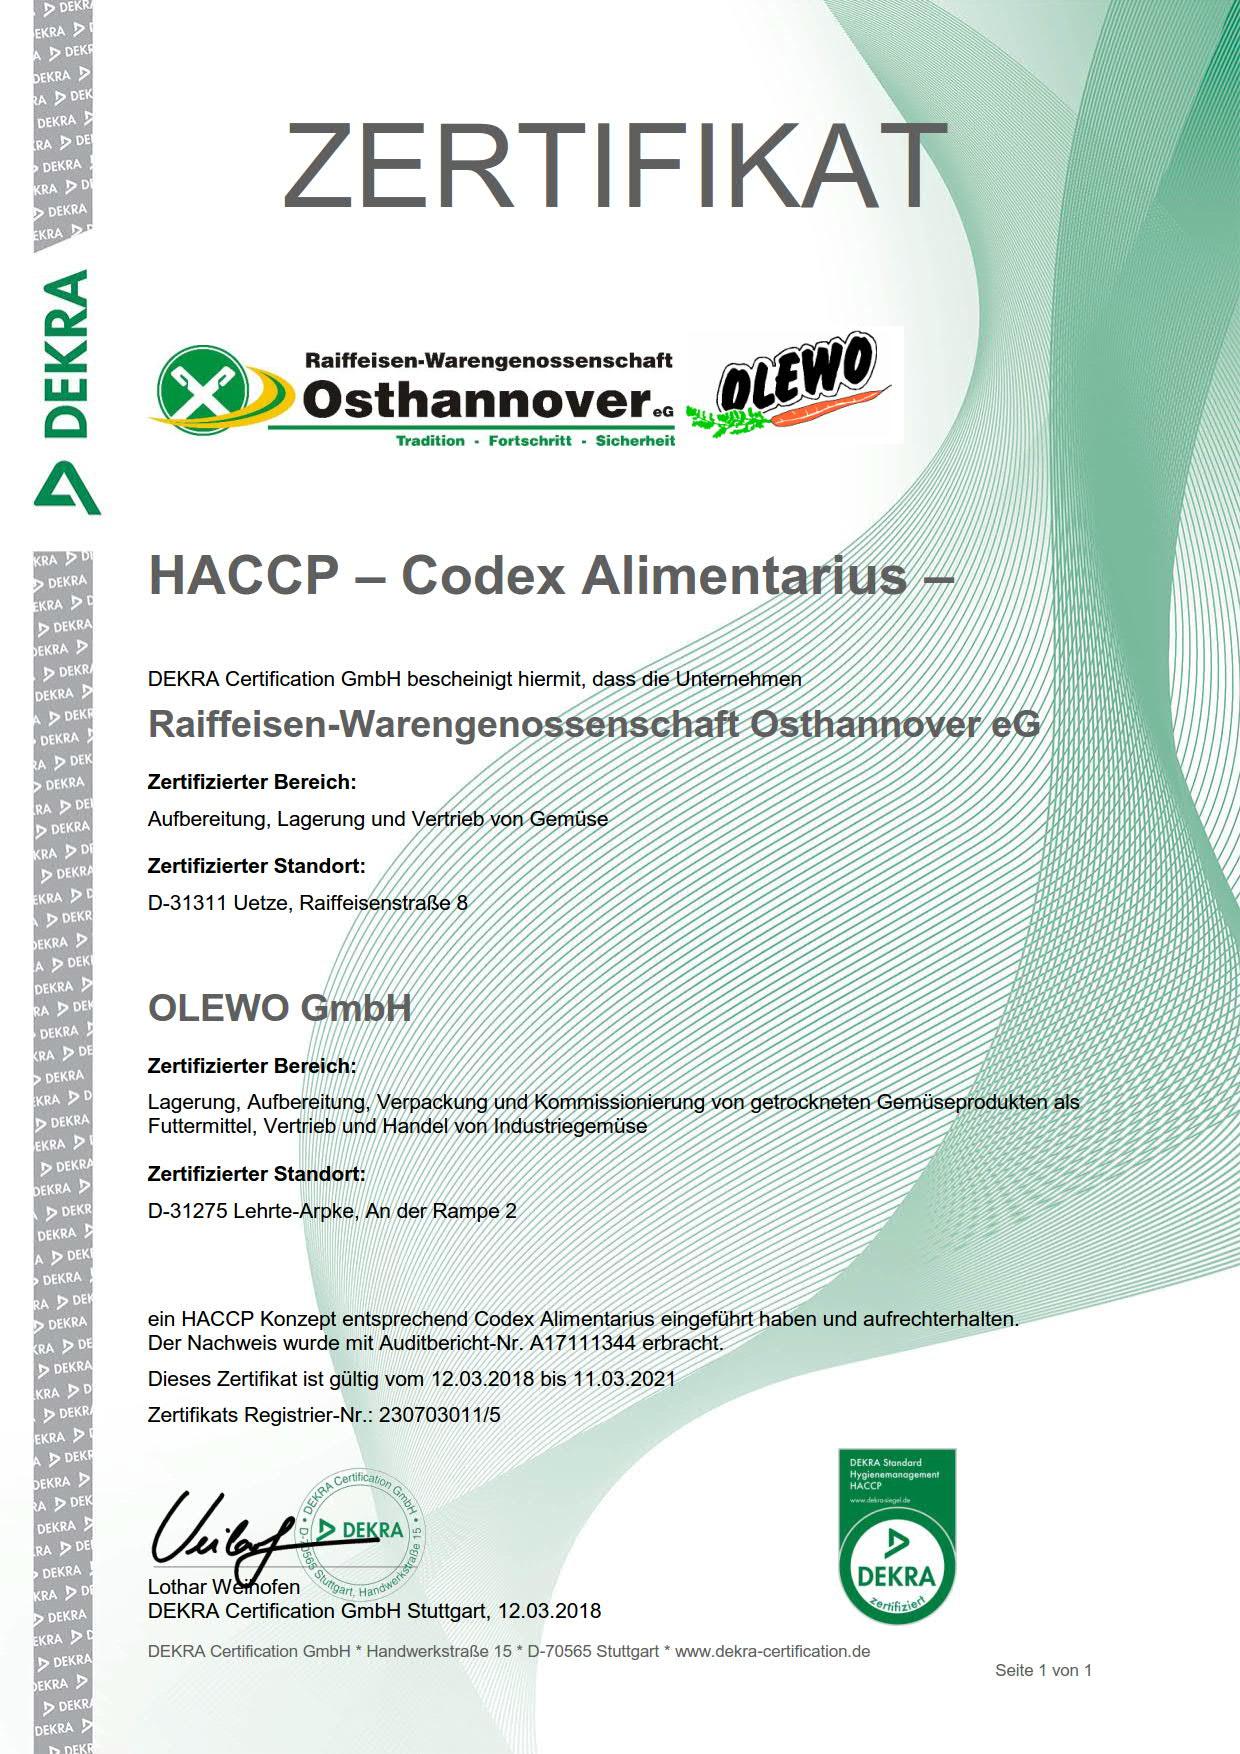 Zertifikate/2019_Rezert._Zertifikat_HACCP_dt.jpg